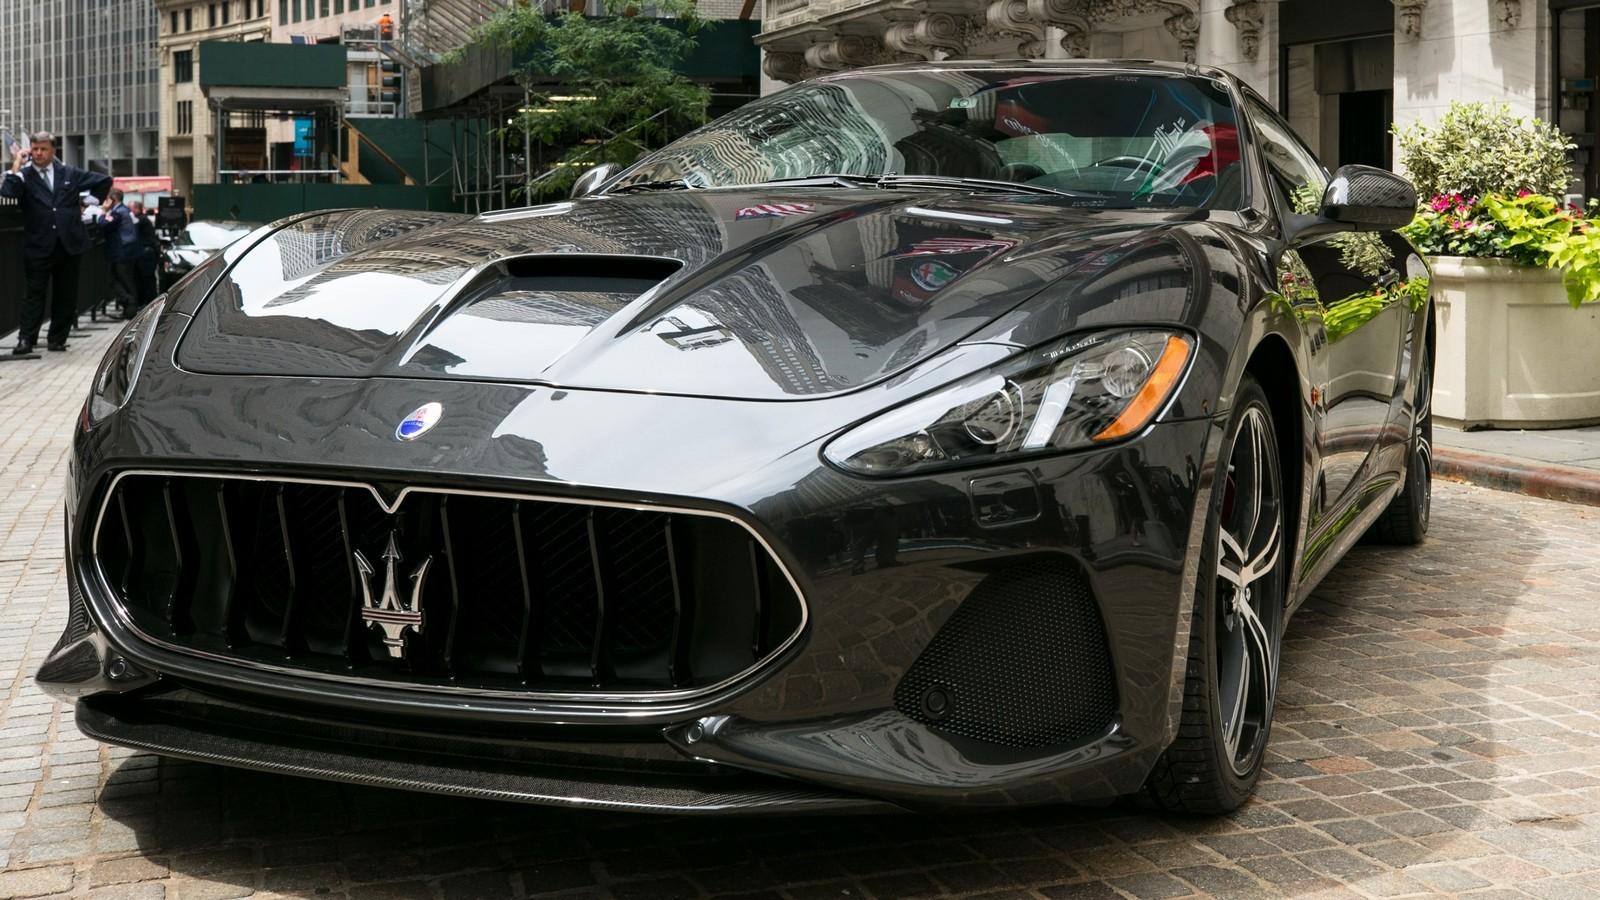 Medium-12743-MaseratiGranTurismoMCMY18atNewYorkStockExchange20171_cr